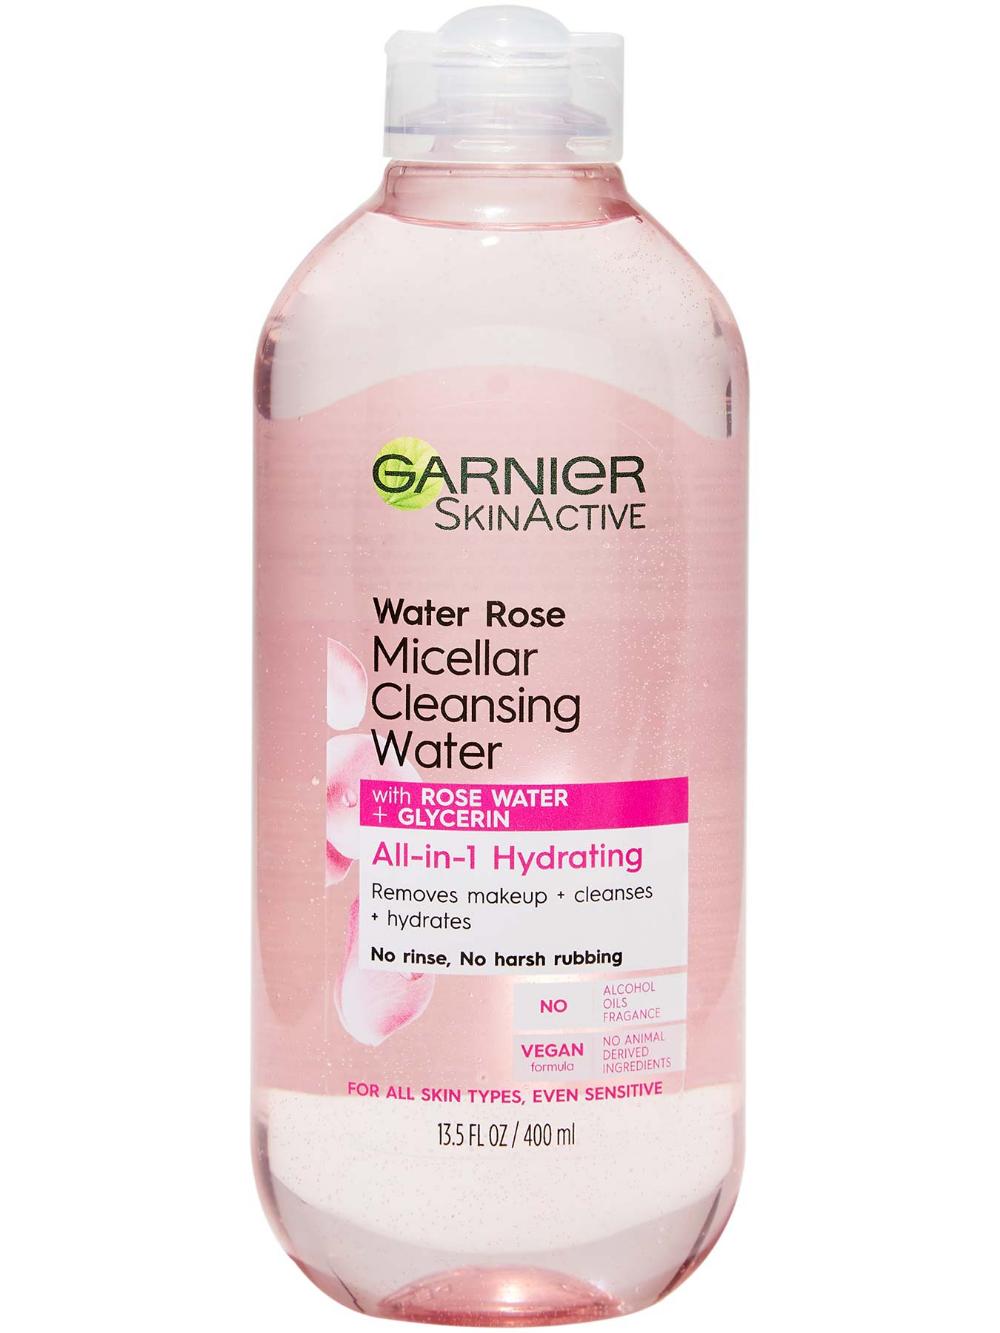 Water Rose Micellar Cleansing Water in 2020 Facial